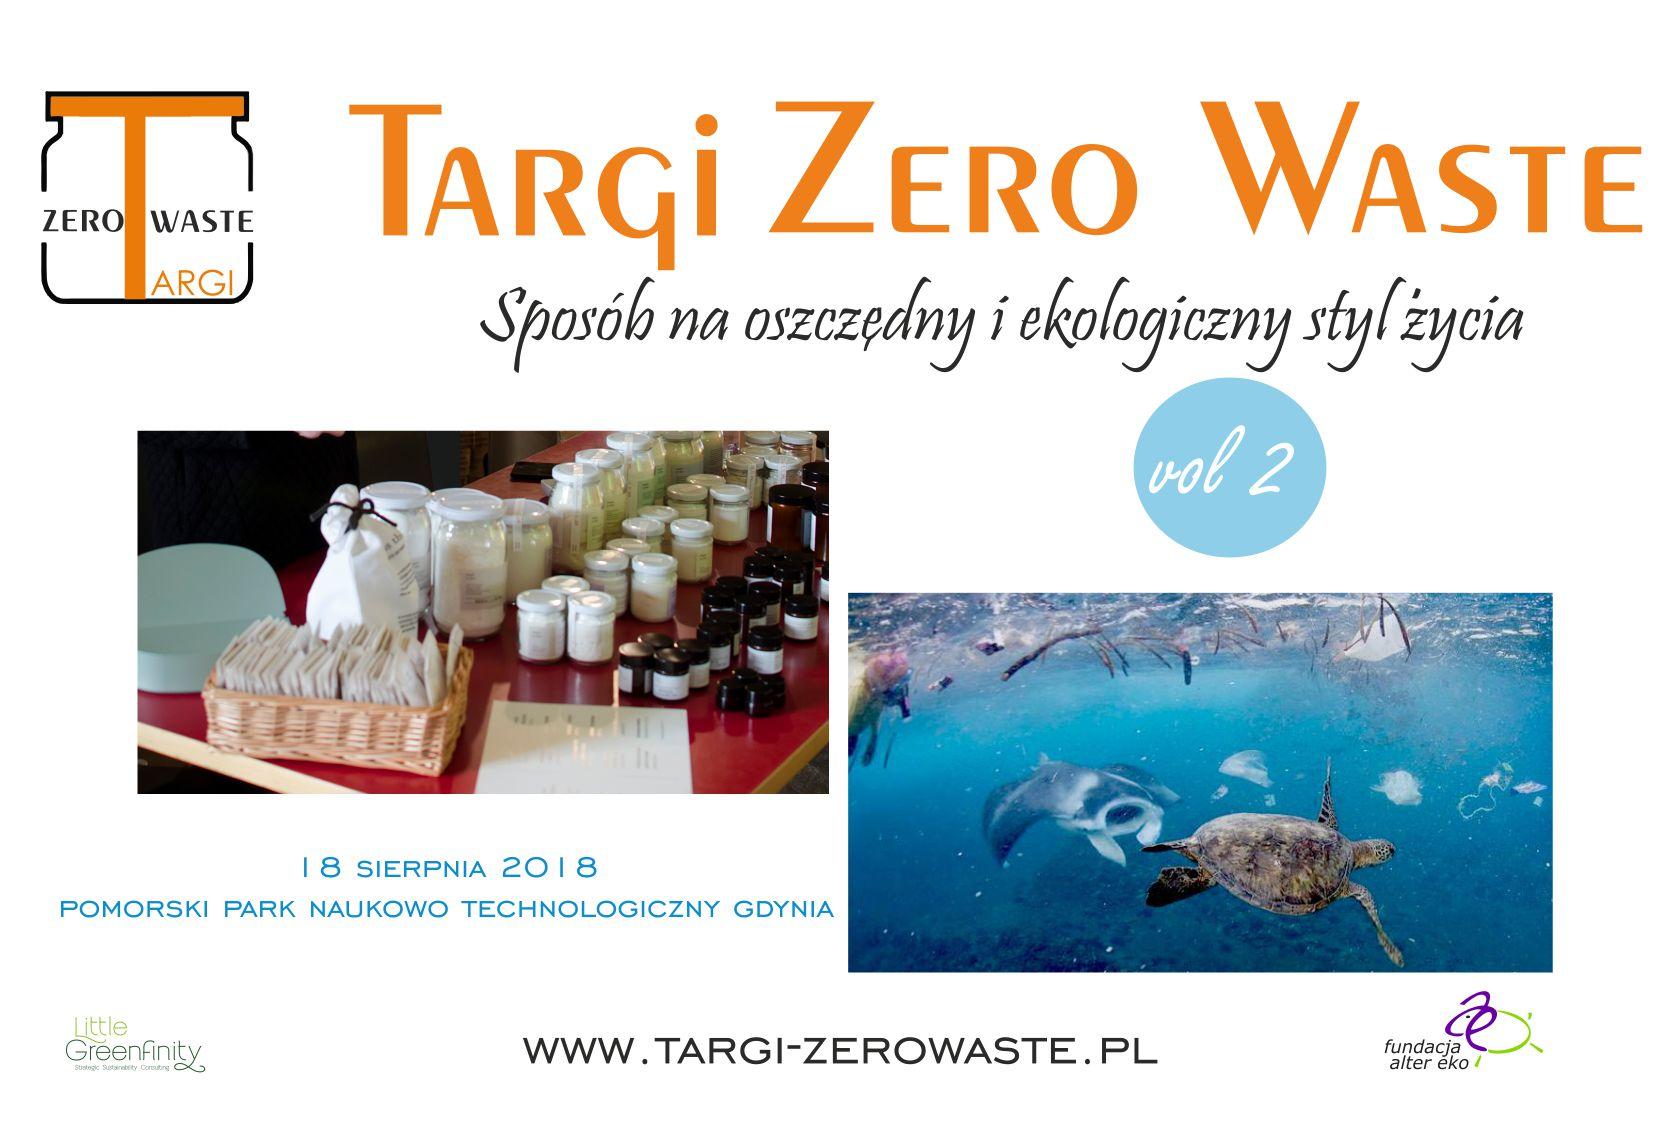 hipoalergiczni-baner-zero-waste-targi-w-gdyni-2018